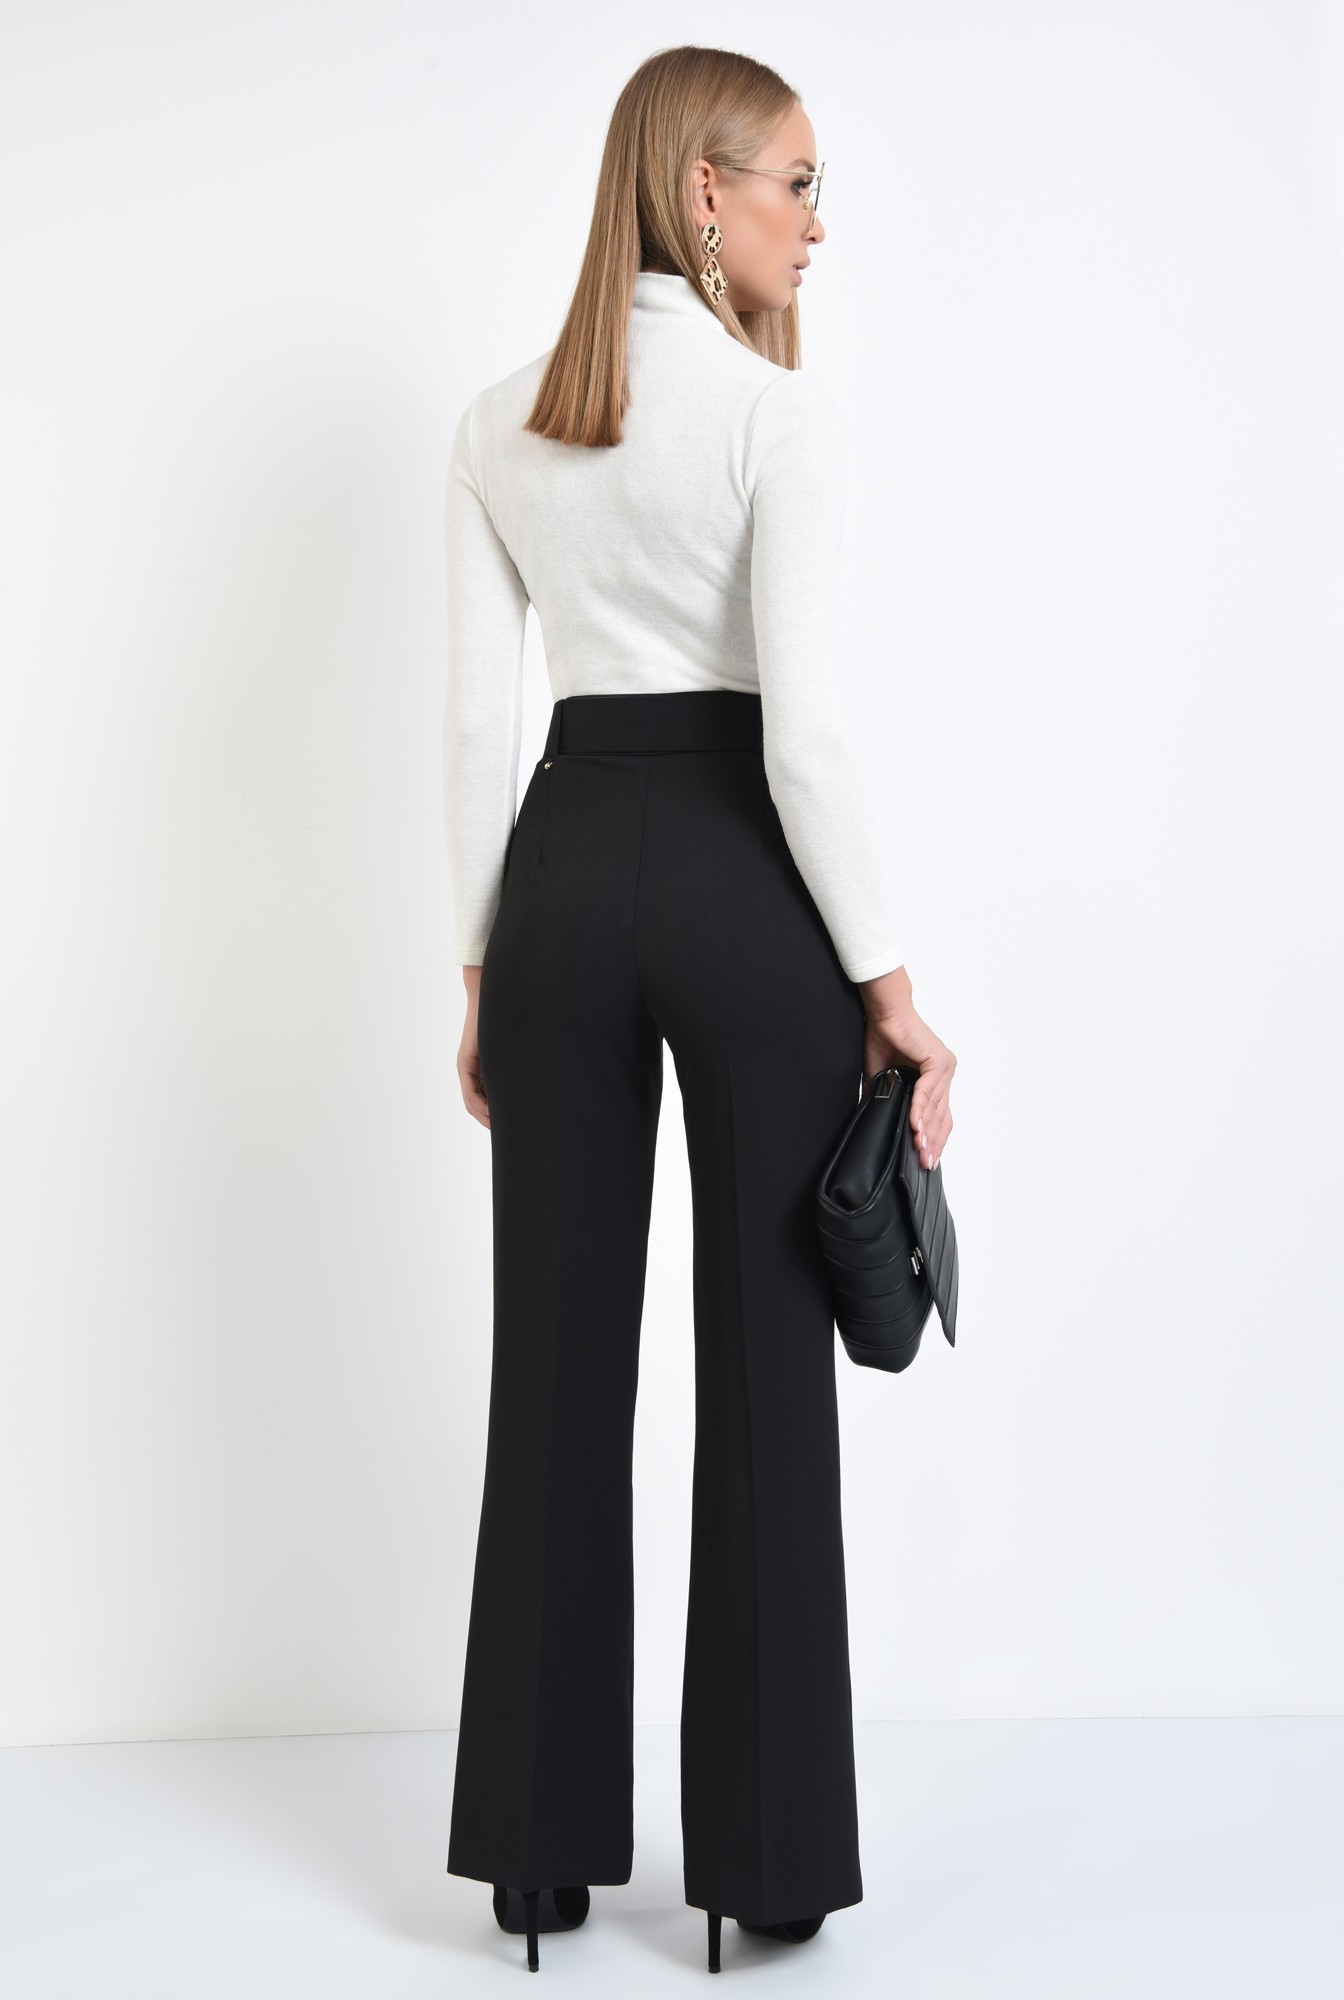 1 - pantaloni de ocazie, centura din material textil, pantaloni online